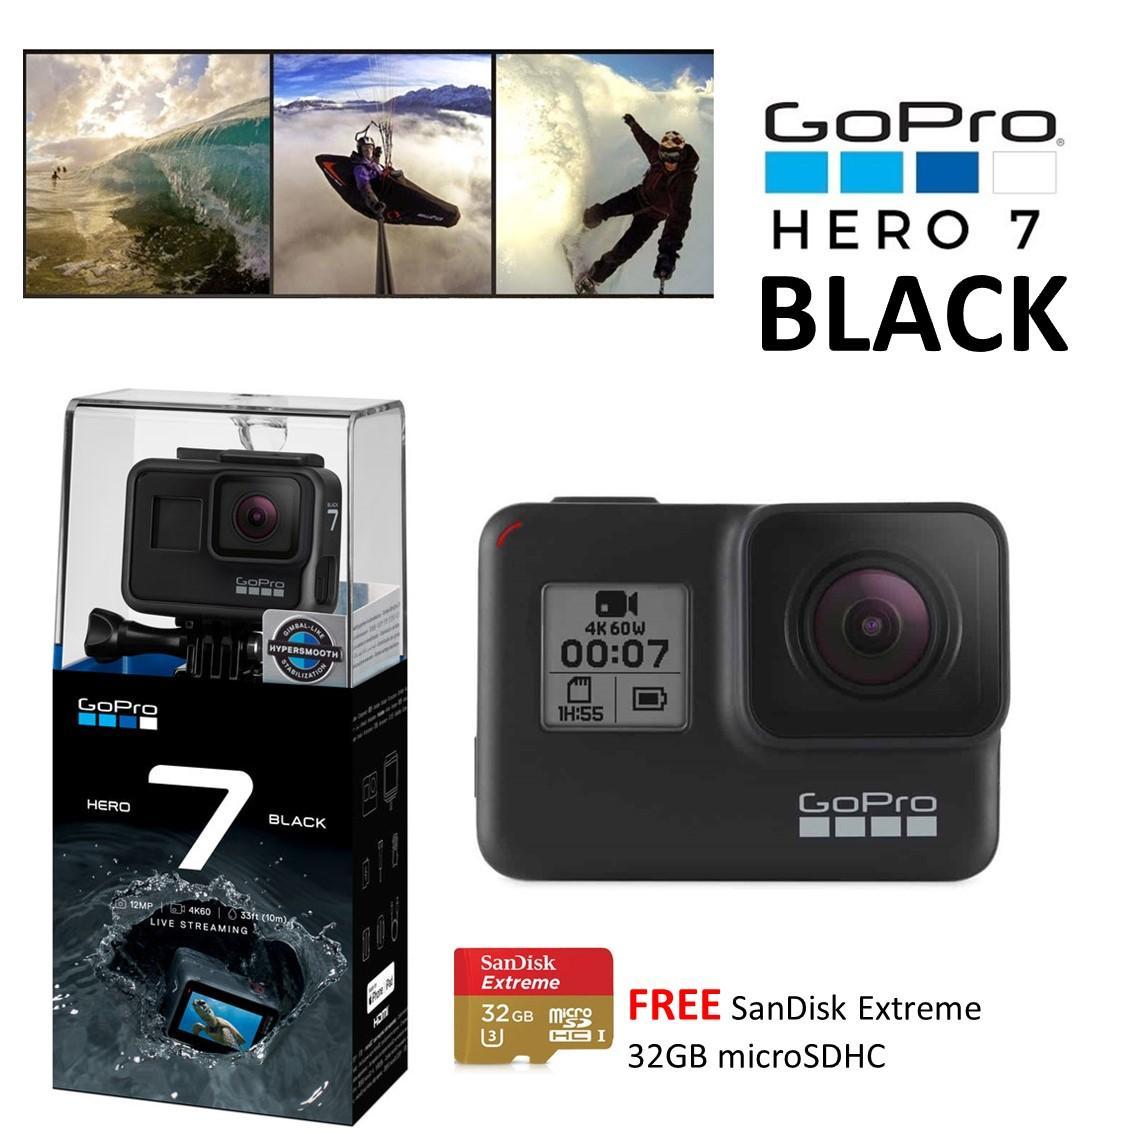 NEW! GoPro Hero 7 Black (International Warranty)